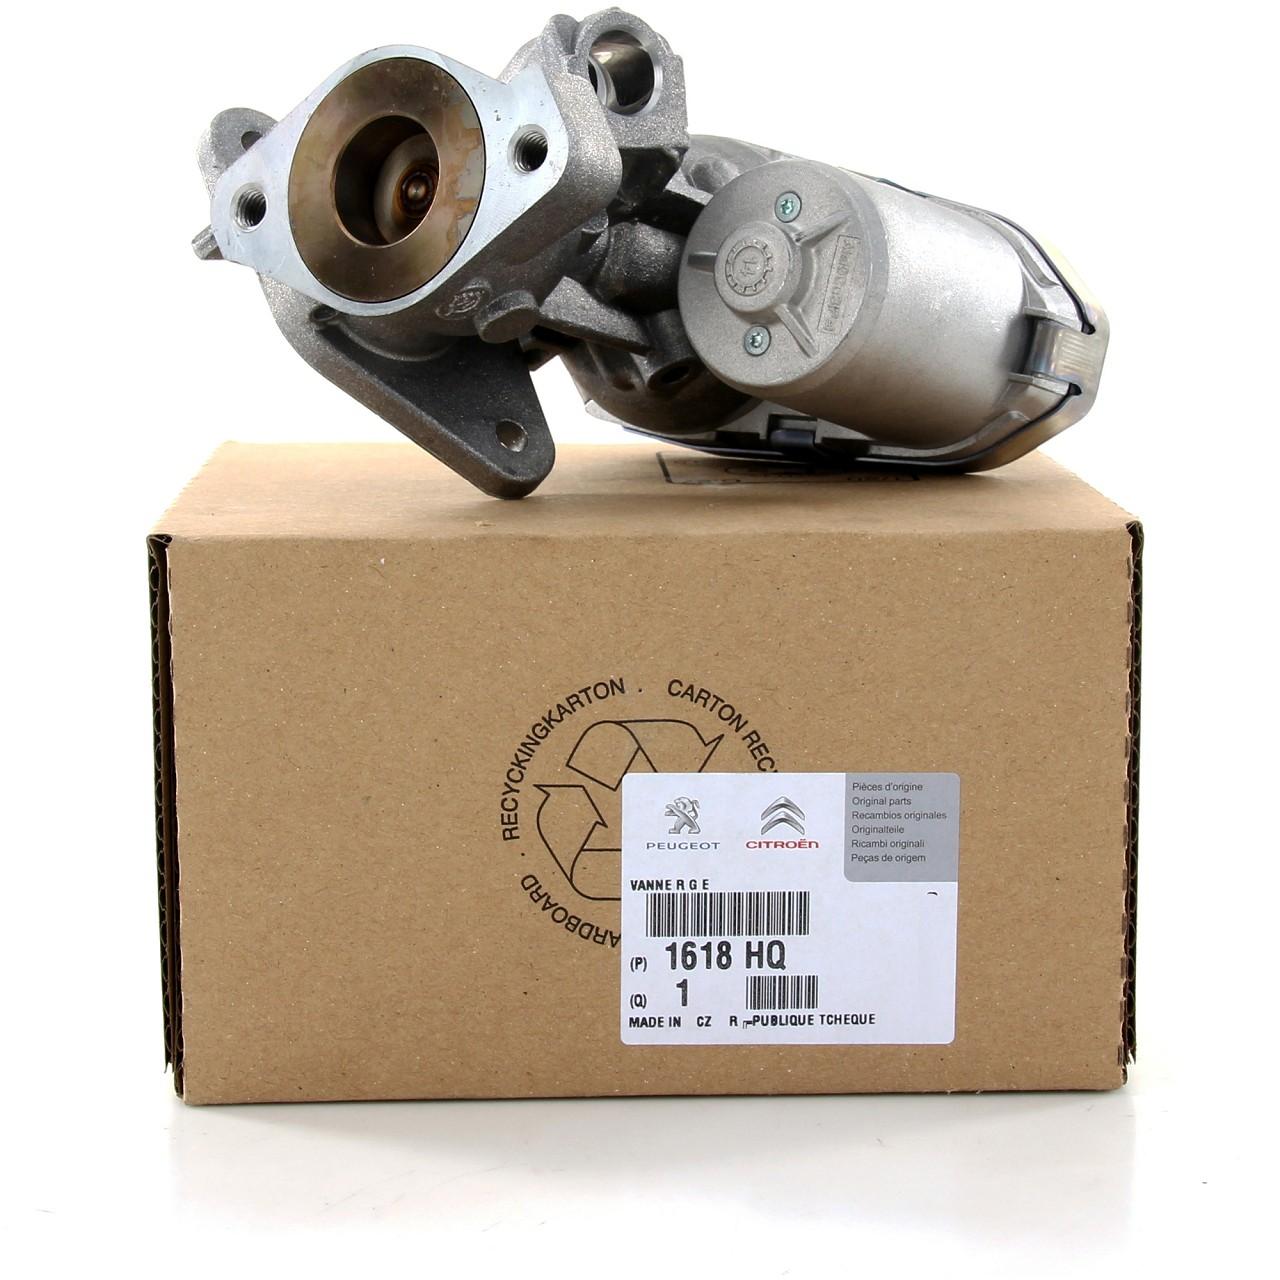 ORIGINAL Citroen Peugeot AGR Ventil JUMPER BOXER 2.2 HDi 101/120 PS 1618.HQ